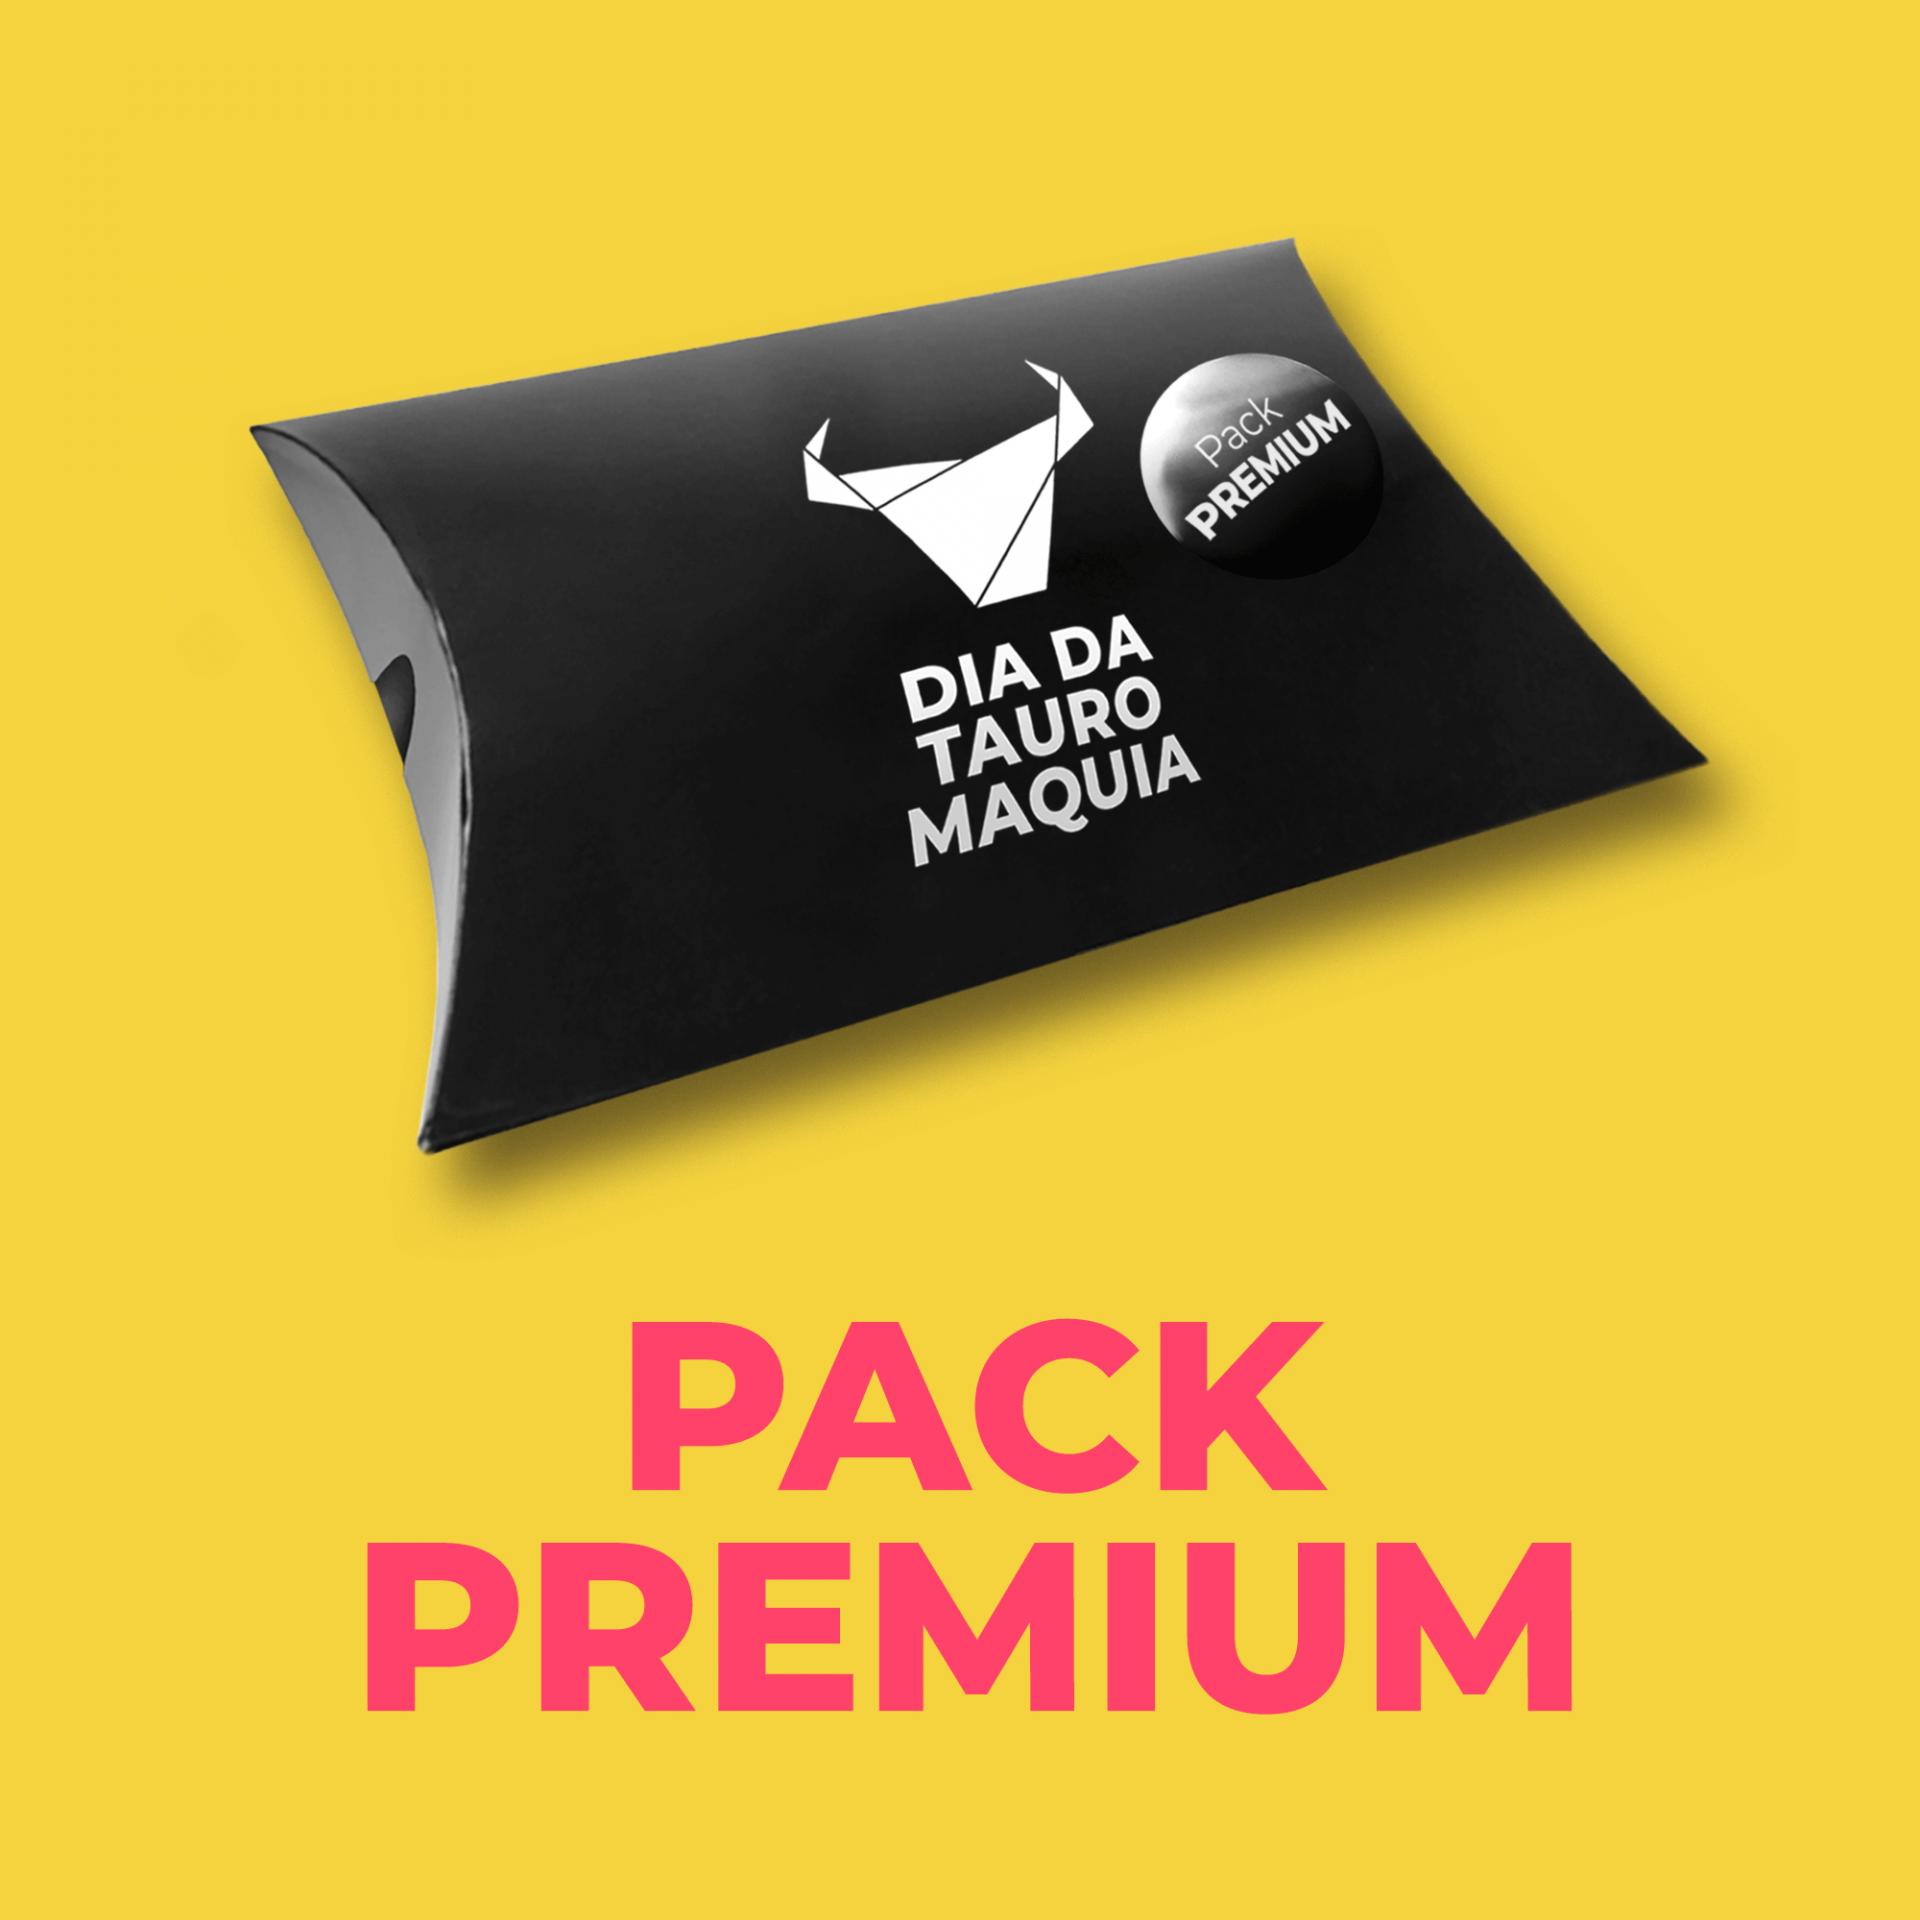 Pack Premium (Dia da Tauromaquia)